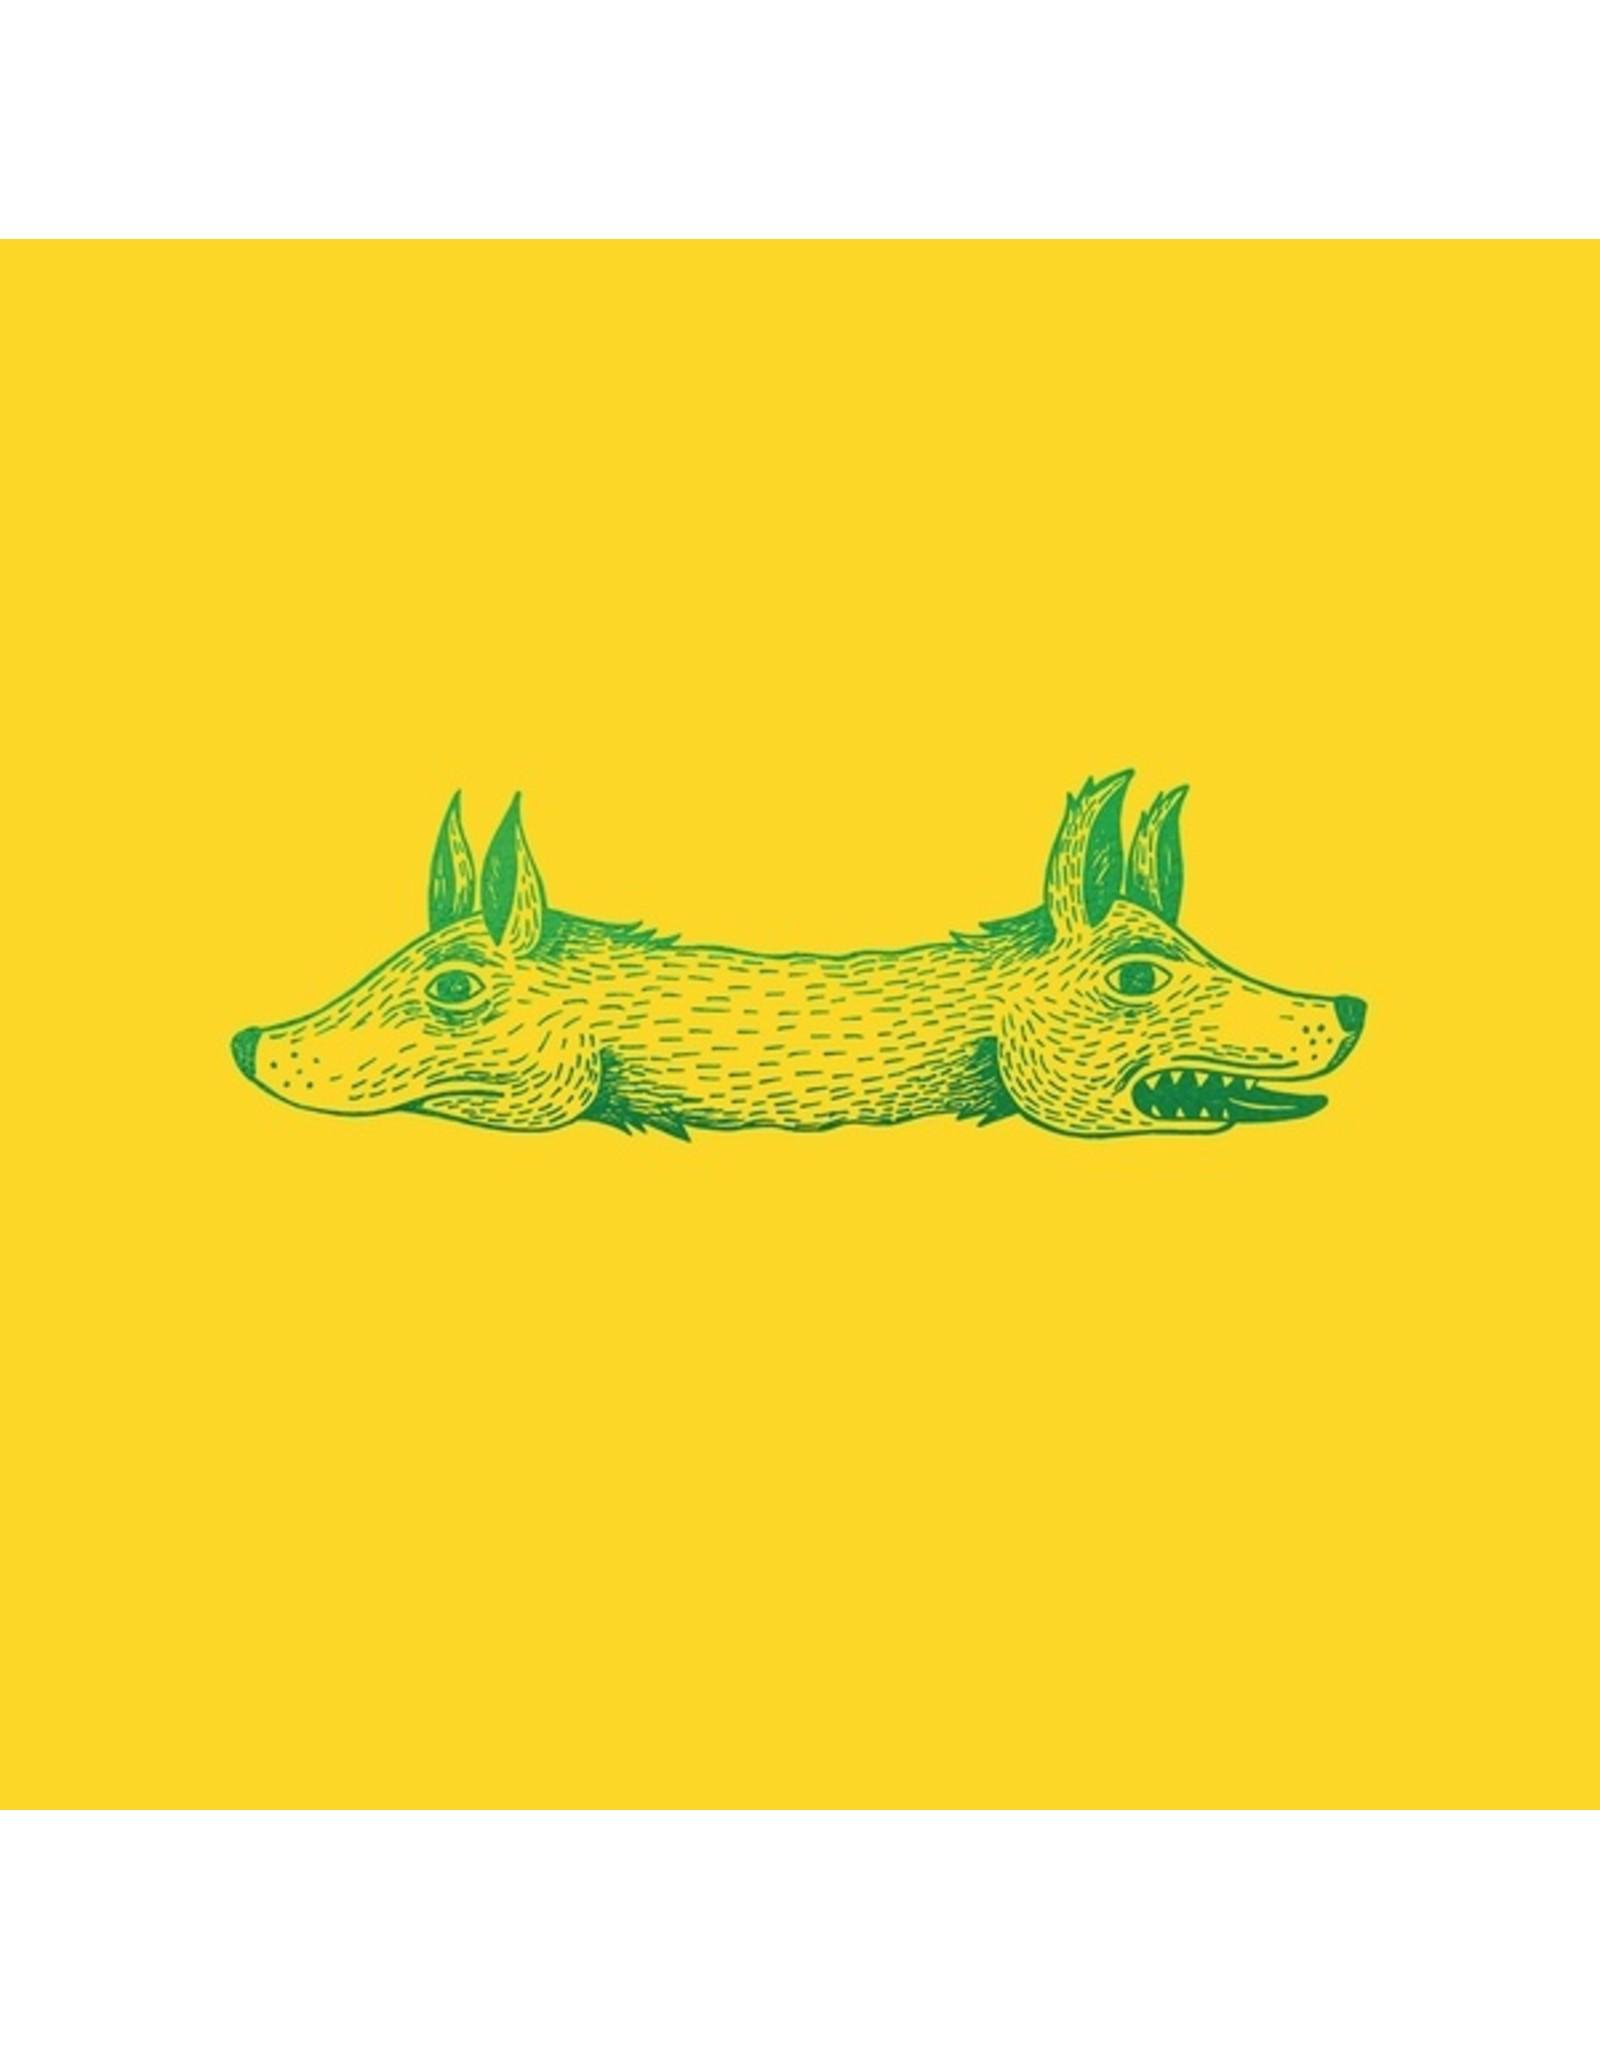 New Vinyl The Dwarfs of East Agouza - The Green Dogs of Dahshur LP